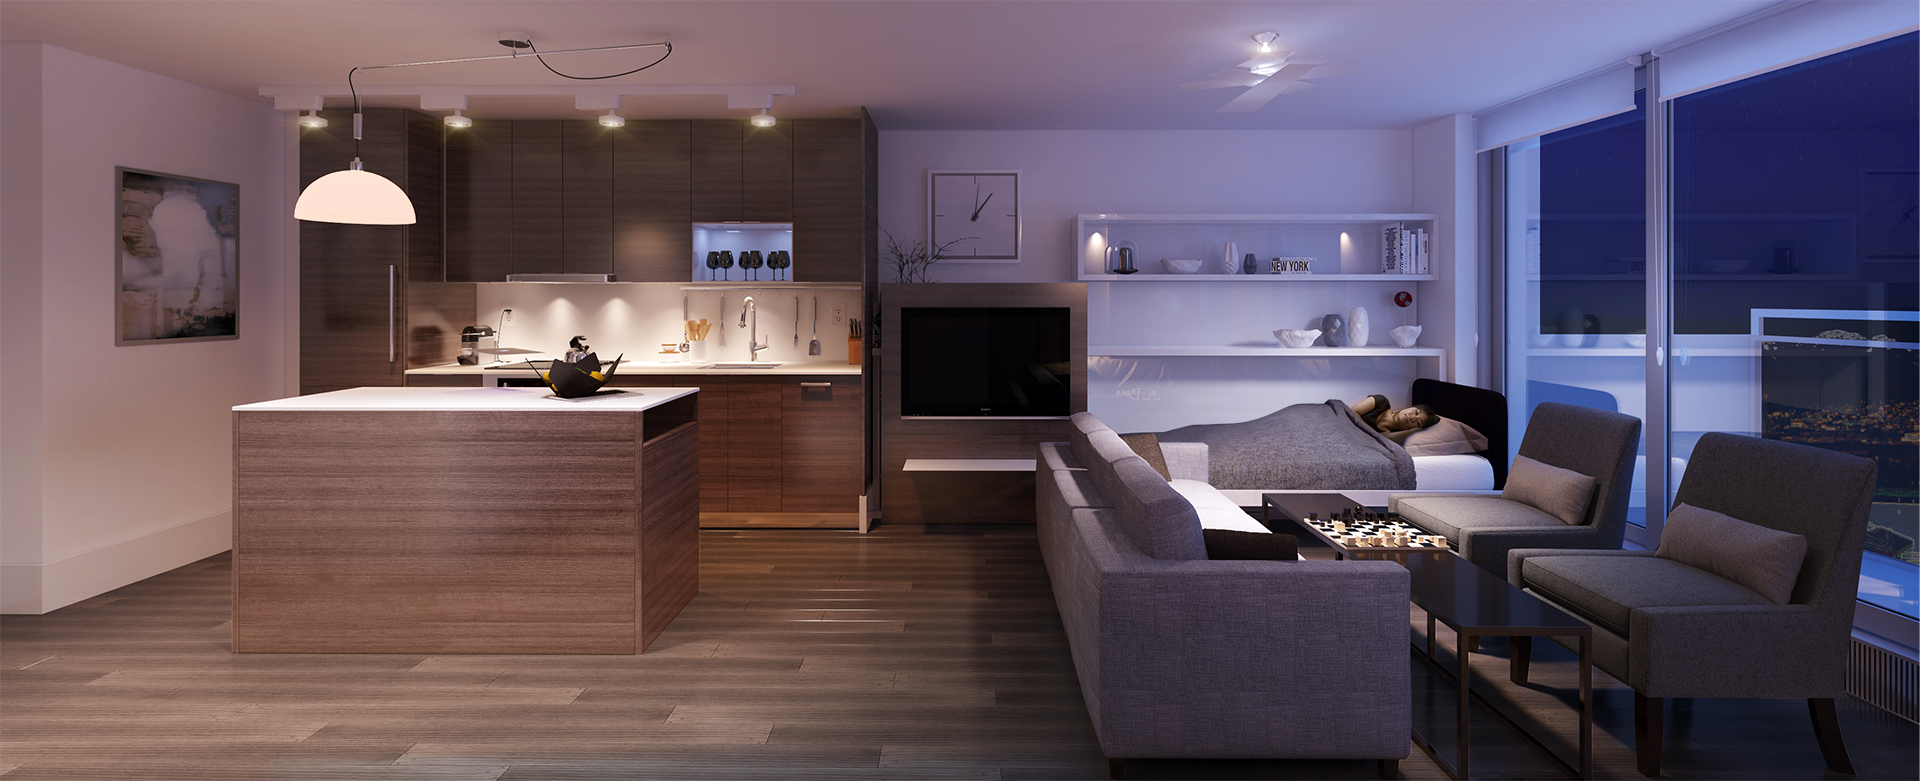 Pullout Sofa Bed Interior Design Ideas